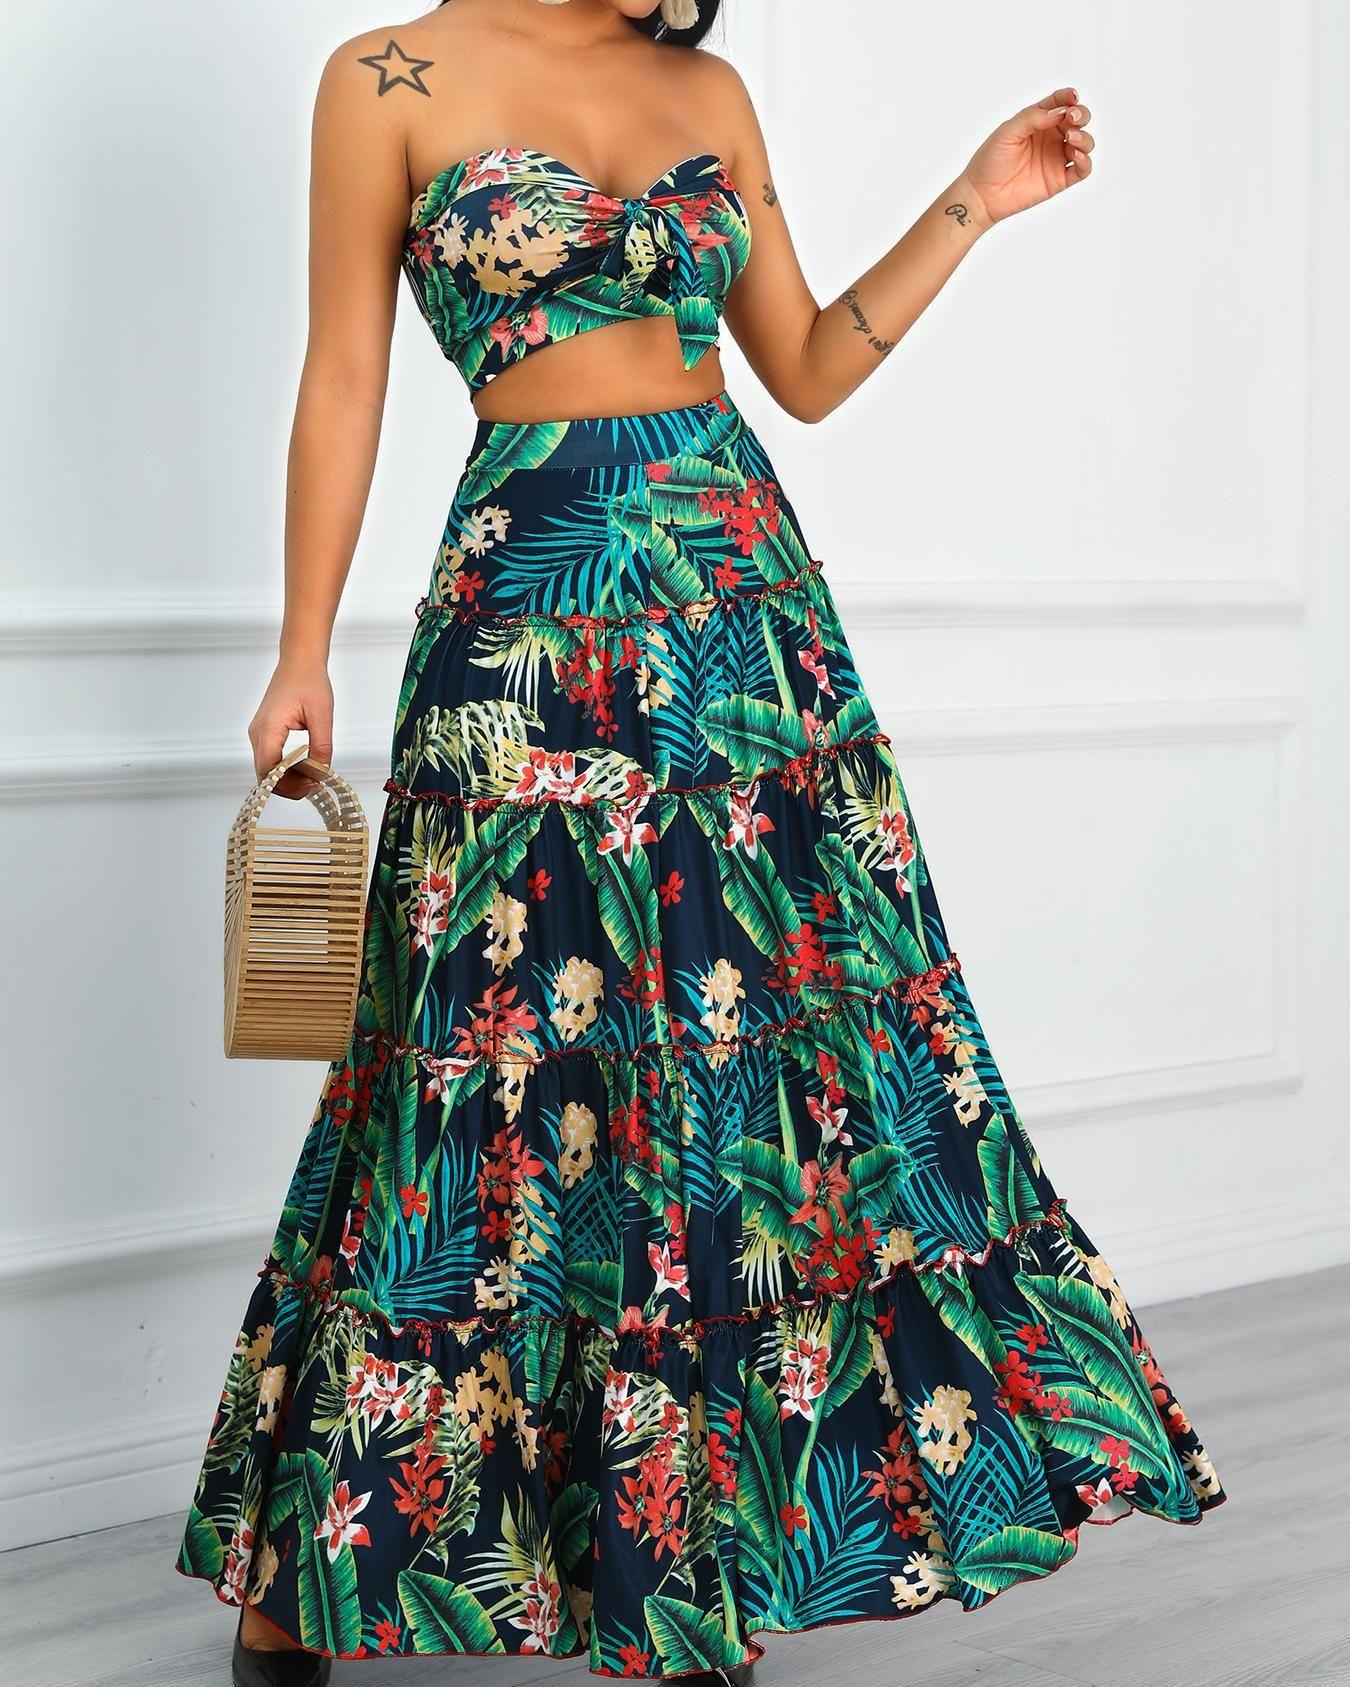 Tropical Print Crop Top Maxi Skirt Set Fashion Maxi Skirt Crop Top Two Piece Dress